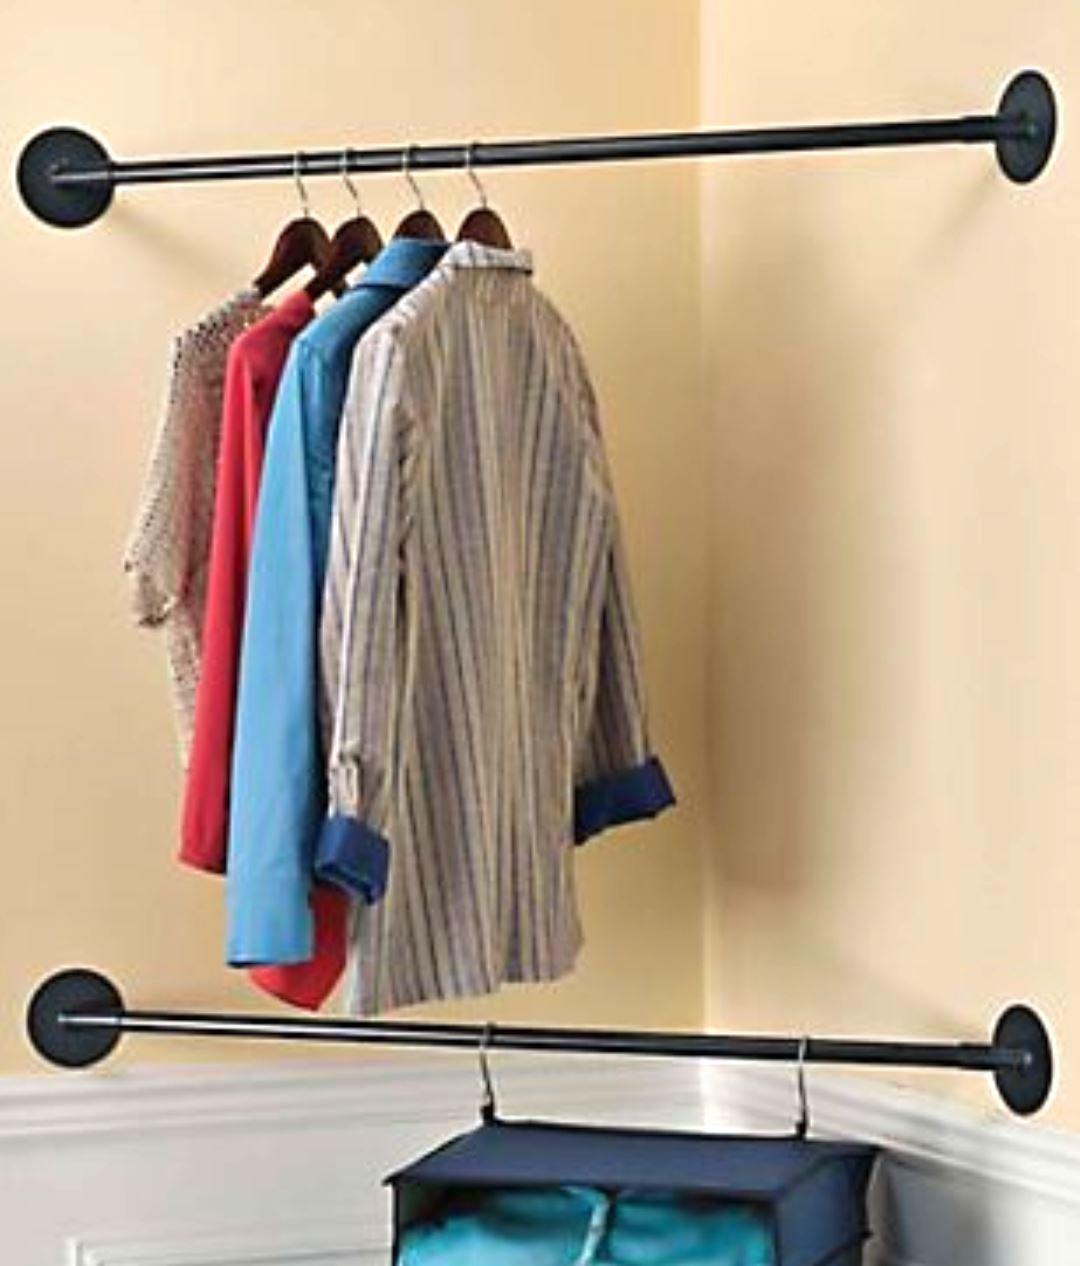 MS Home Corner Closet - Clothes Organizer - Set of 2 Metal Space Saving Rods - w/Wall Hardware - 43'' L